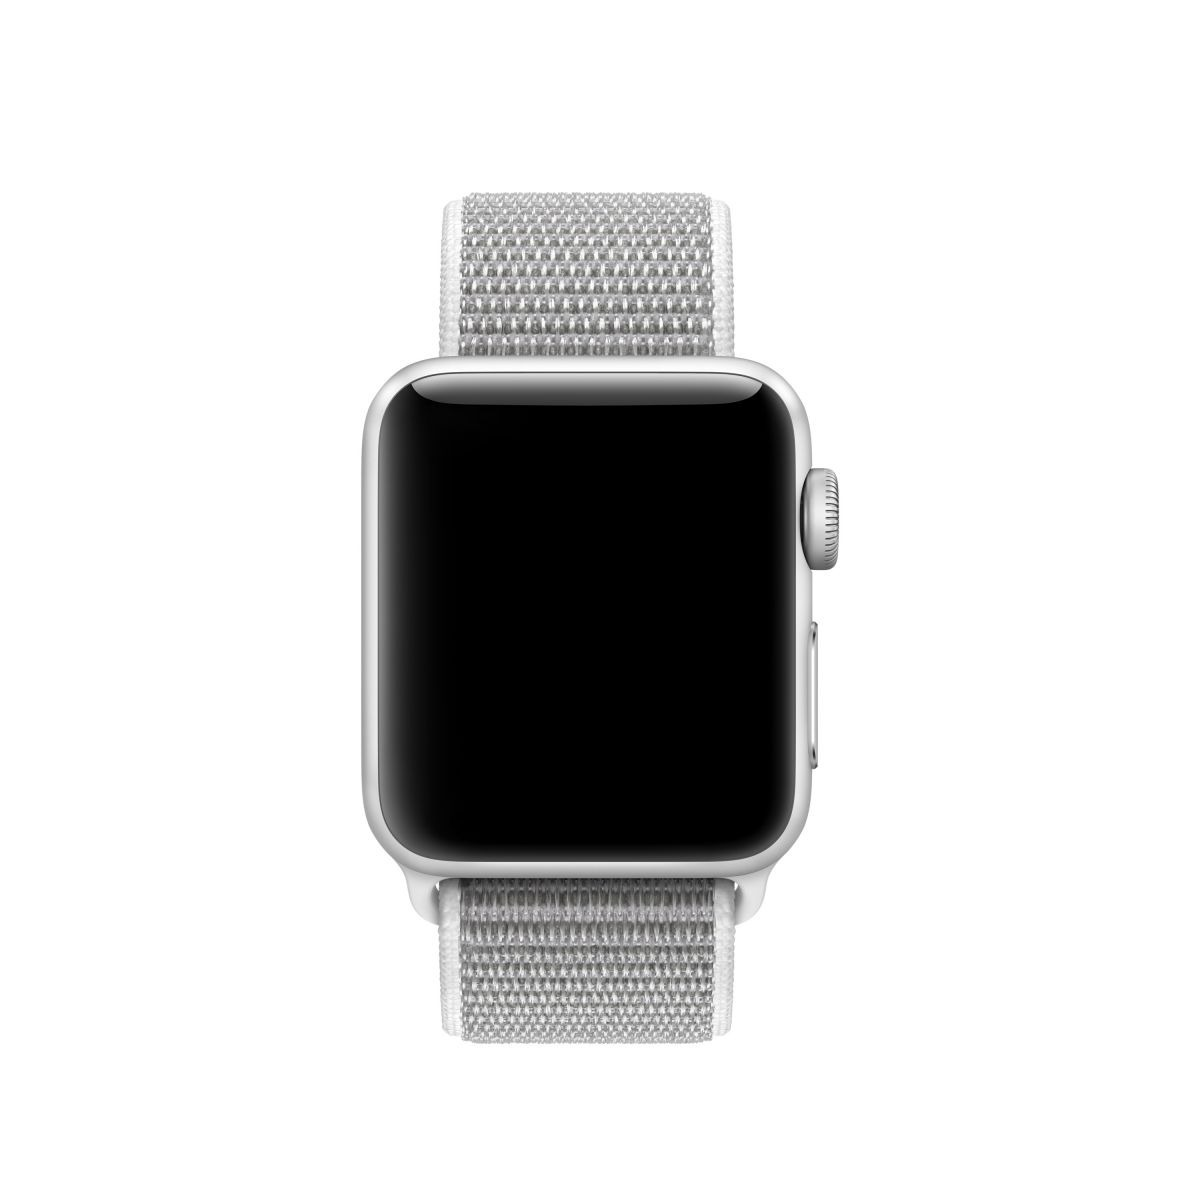 fb86a21db51 pulseira apple watch nylon loop iwatch 38mm + case. Carregando zoom.